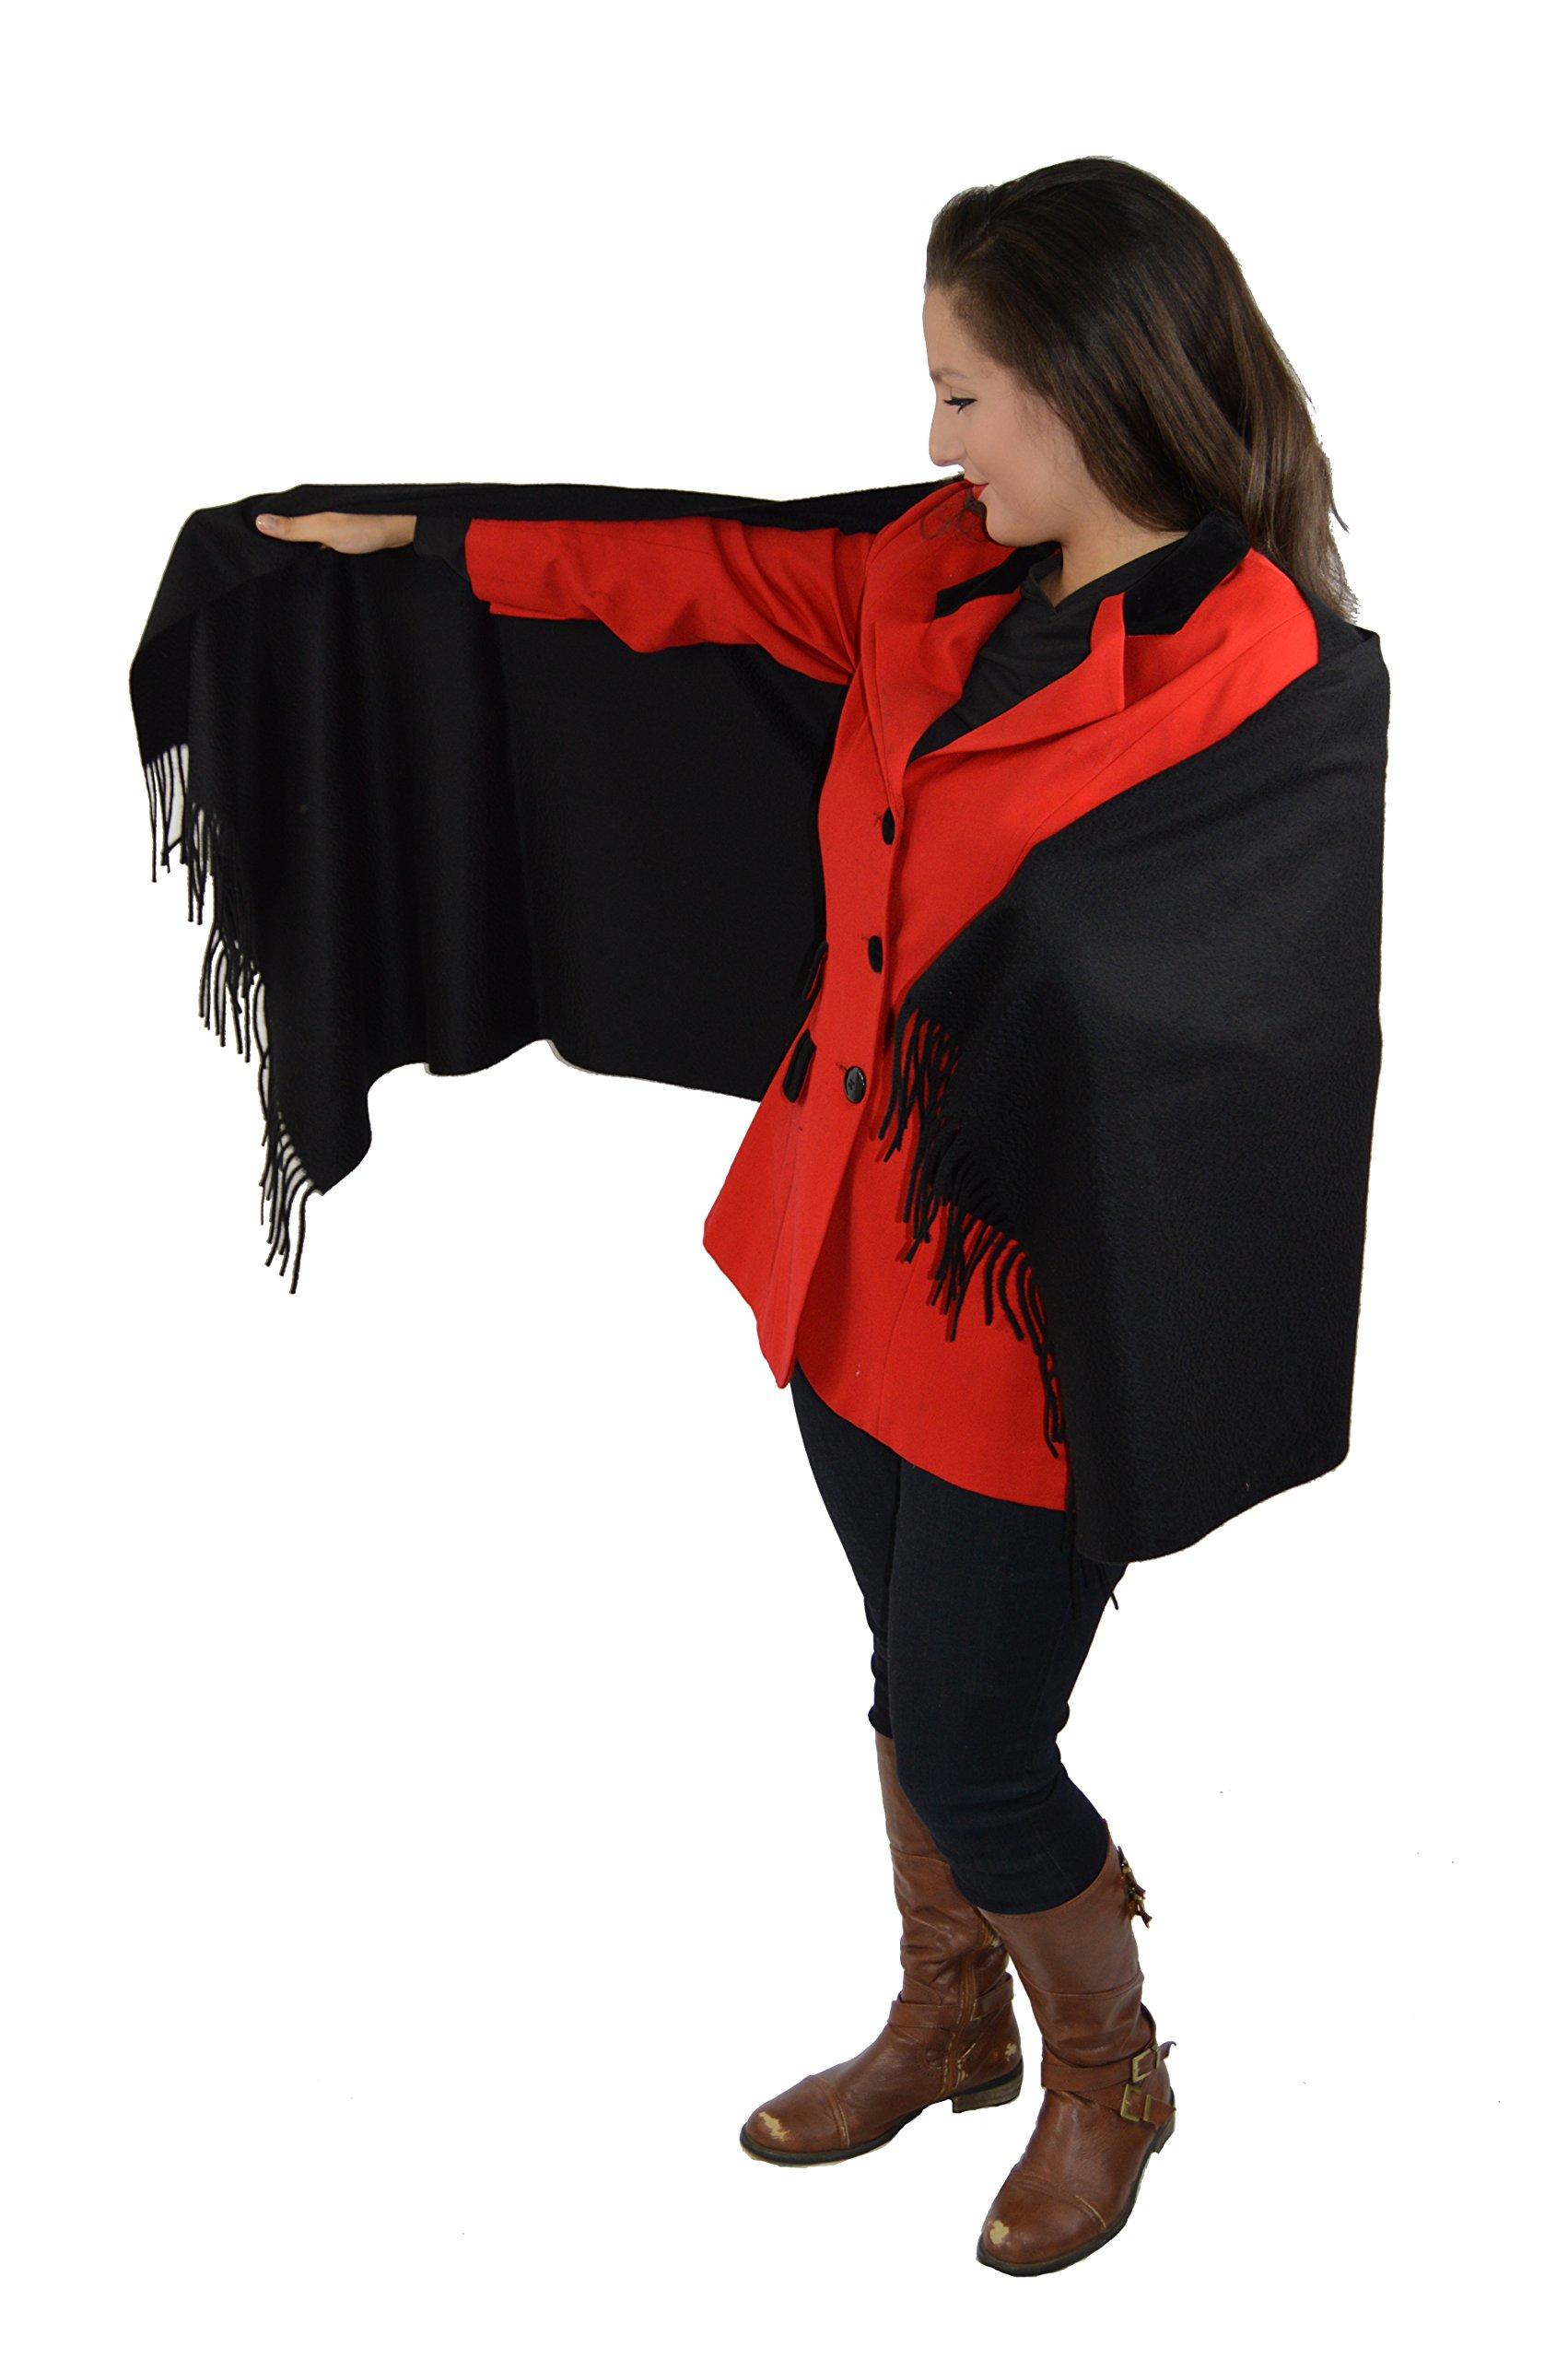 Cashmere Pashmina Group-Cashmere Shawl Scarf Wrap Stole (Solid/ Reversible Print w/ Genuine Fur) - Solid Ebony Black